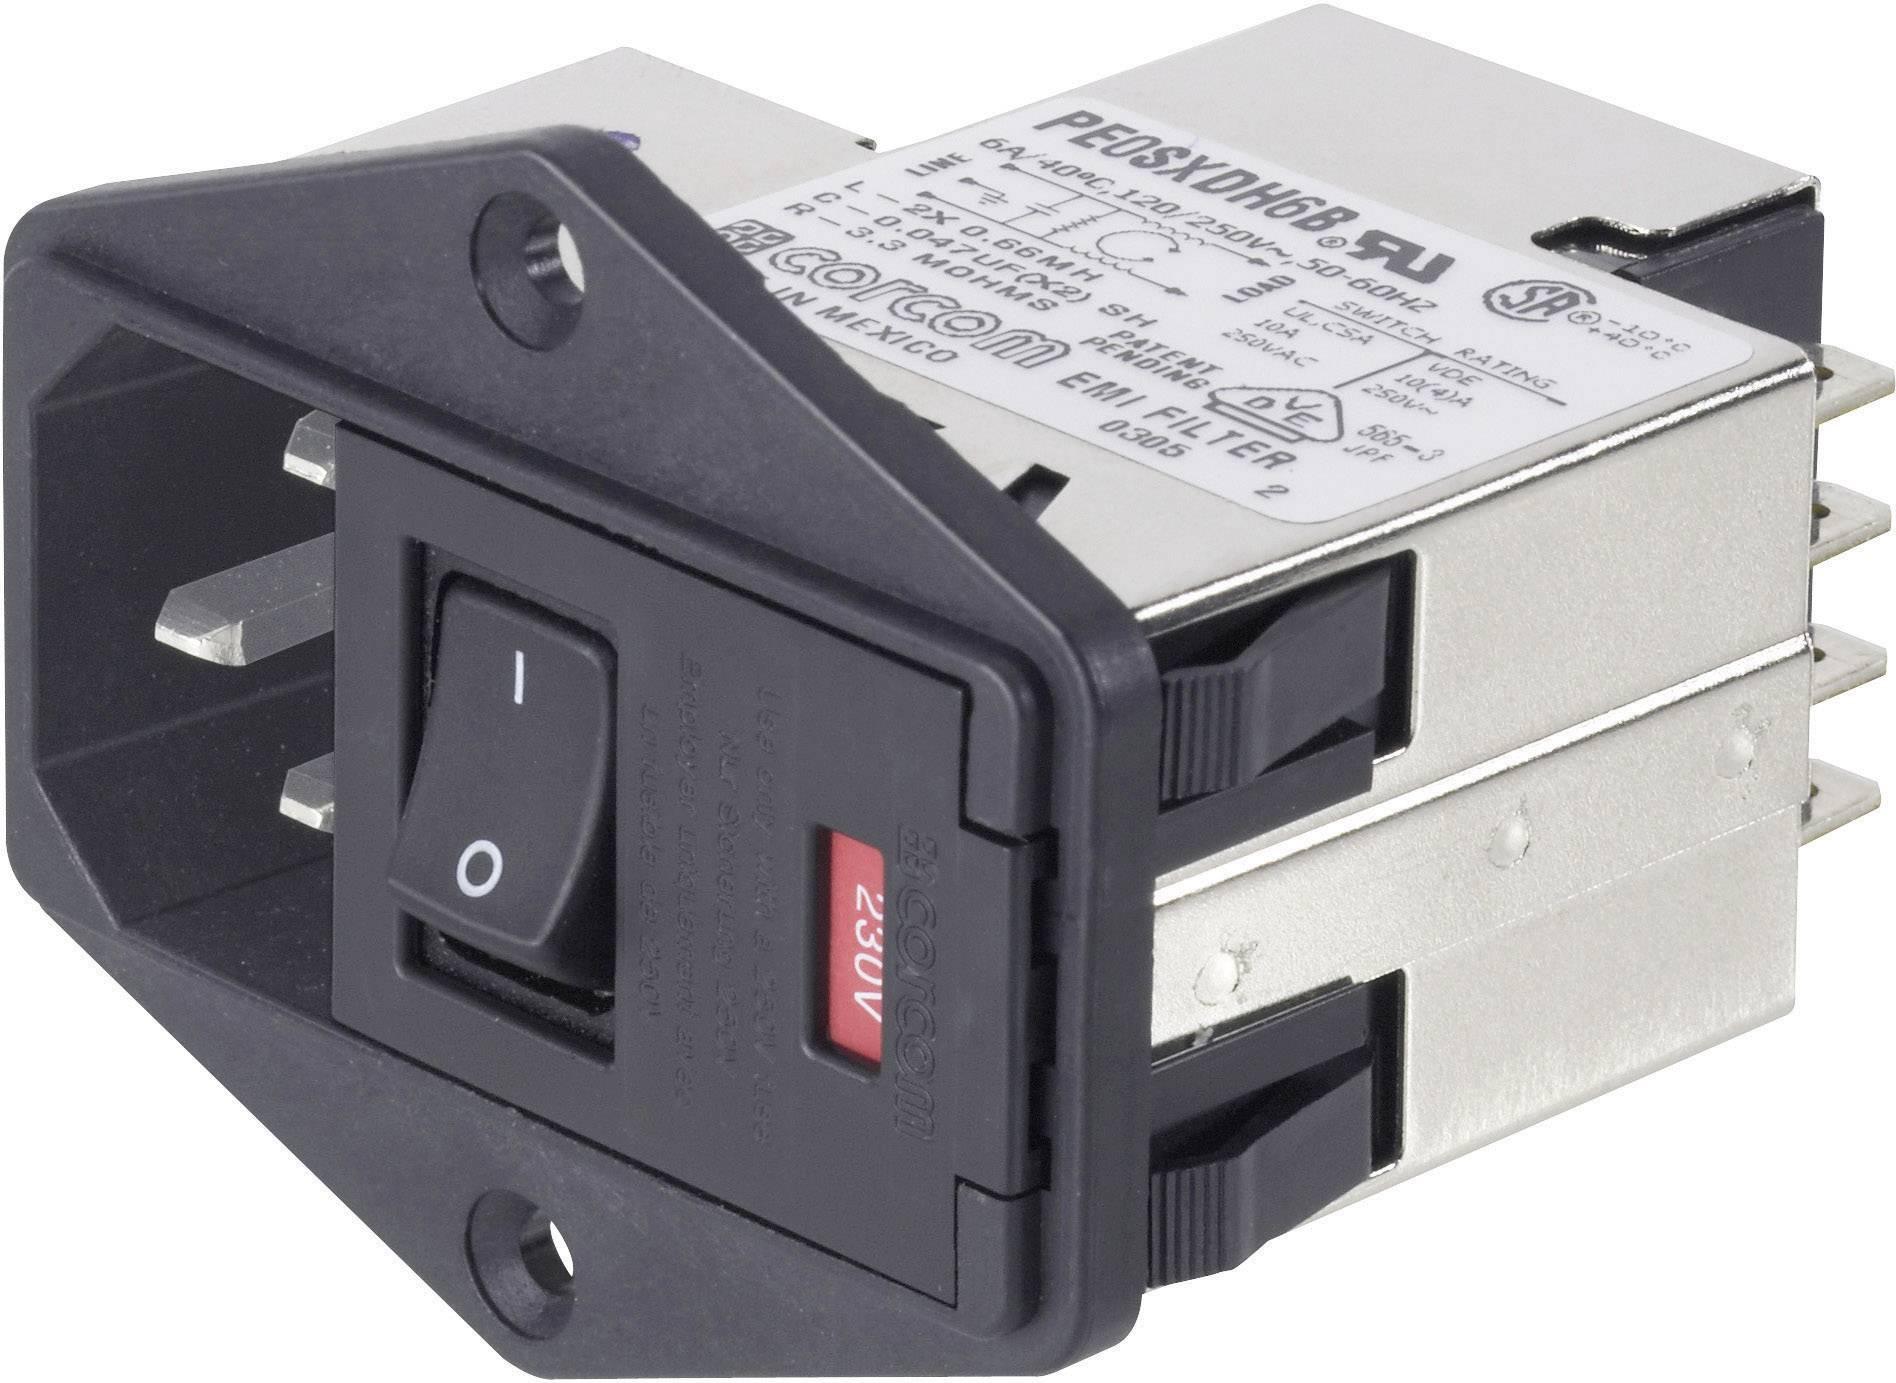 Síťový filtr TE Connectivity, PS0SXDH6A=C1171, 250 V/AC, 6 A